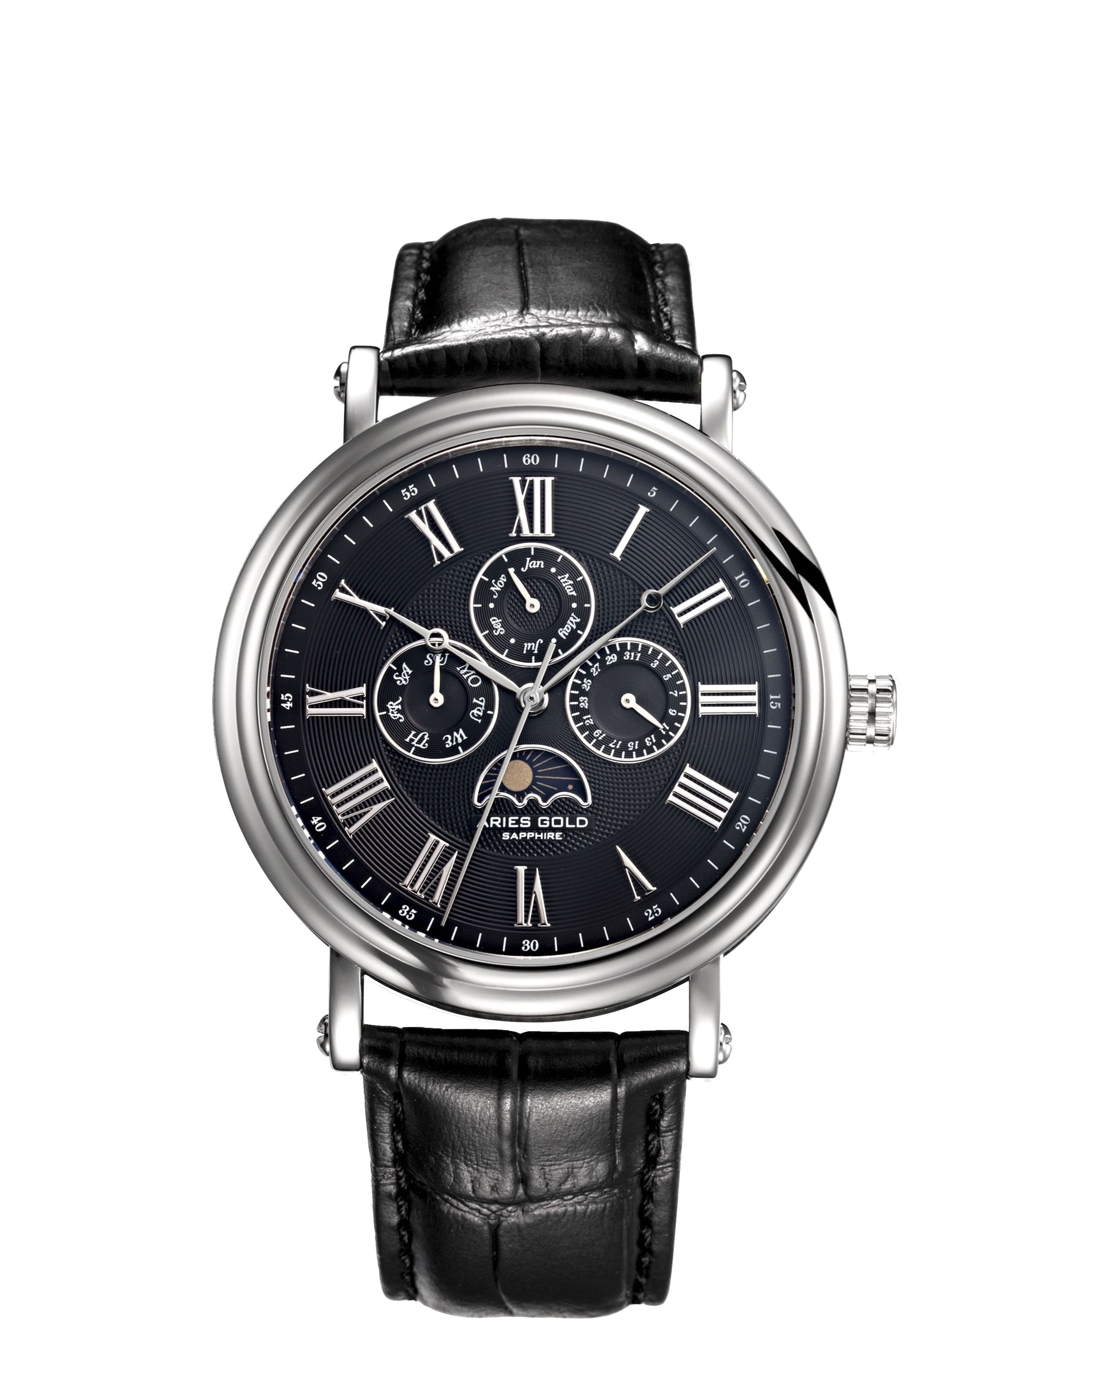 ★Aries Gold★-雅力士手錶-KENSINGTON-G 101 S-BK-錶現精品公司-原廠公司貨